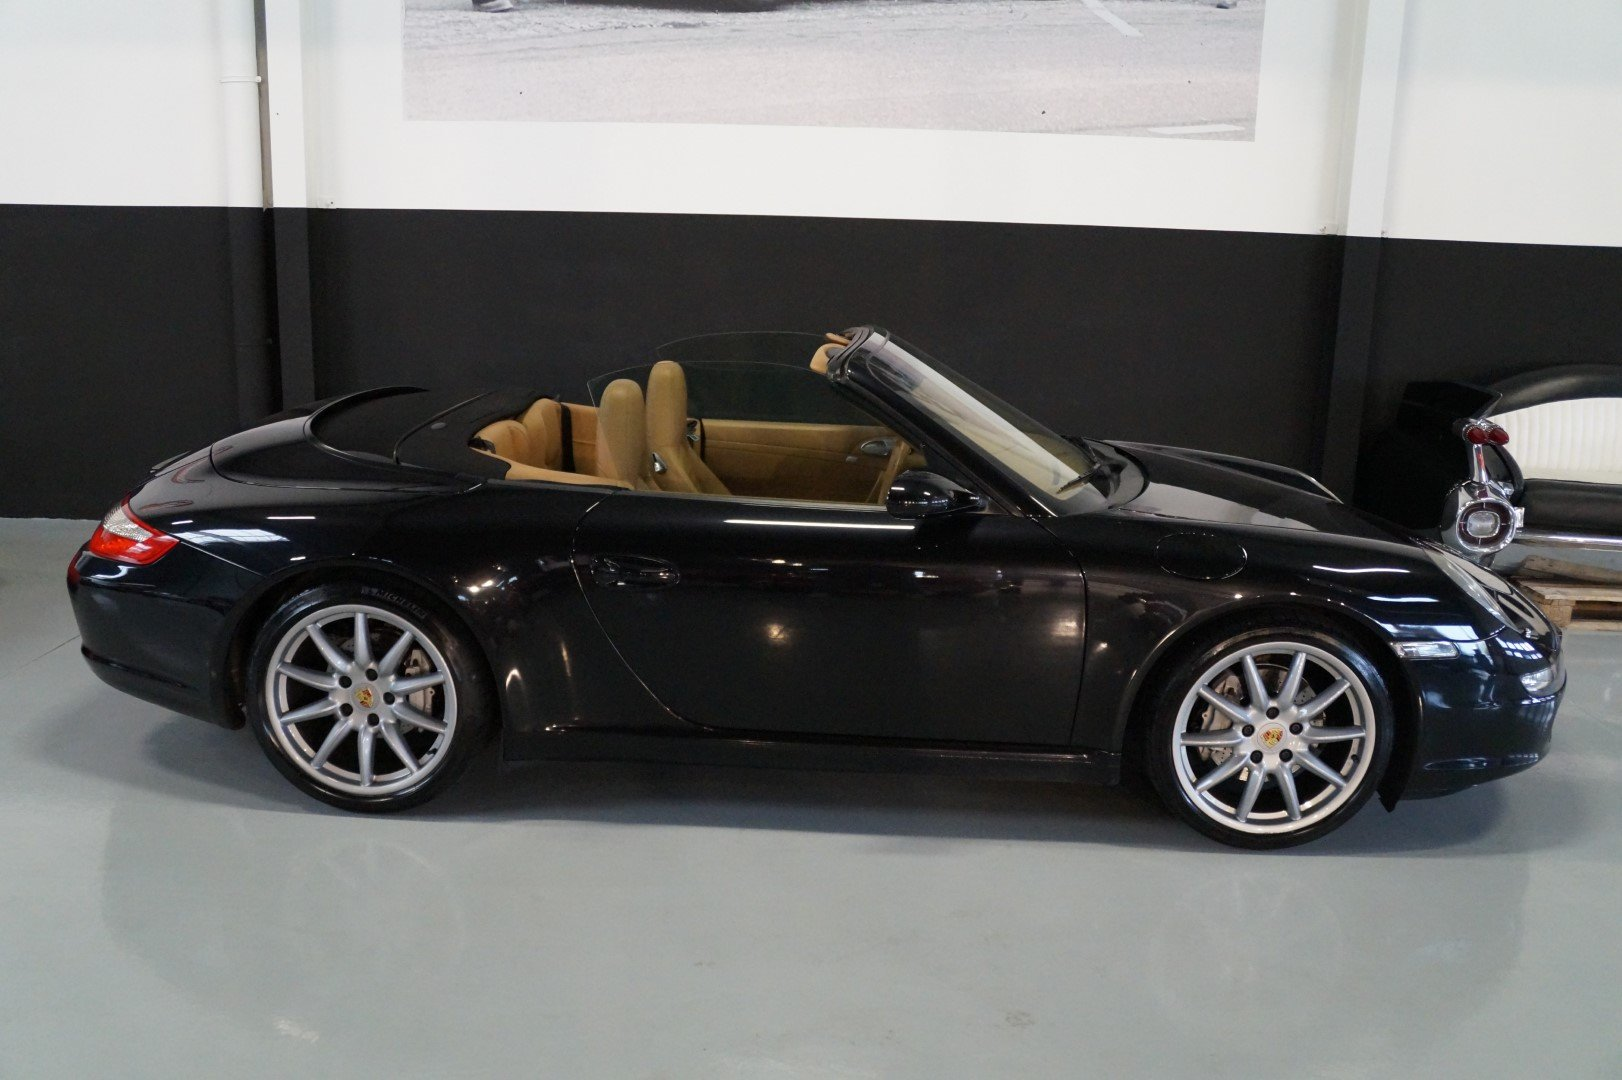 PORSCHE 911 997 Carrera 2 Convertible MANUAL!!! (2006) For Sale (picture 2 of 6)